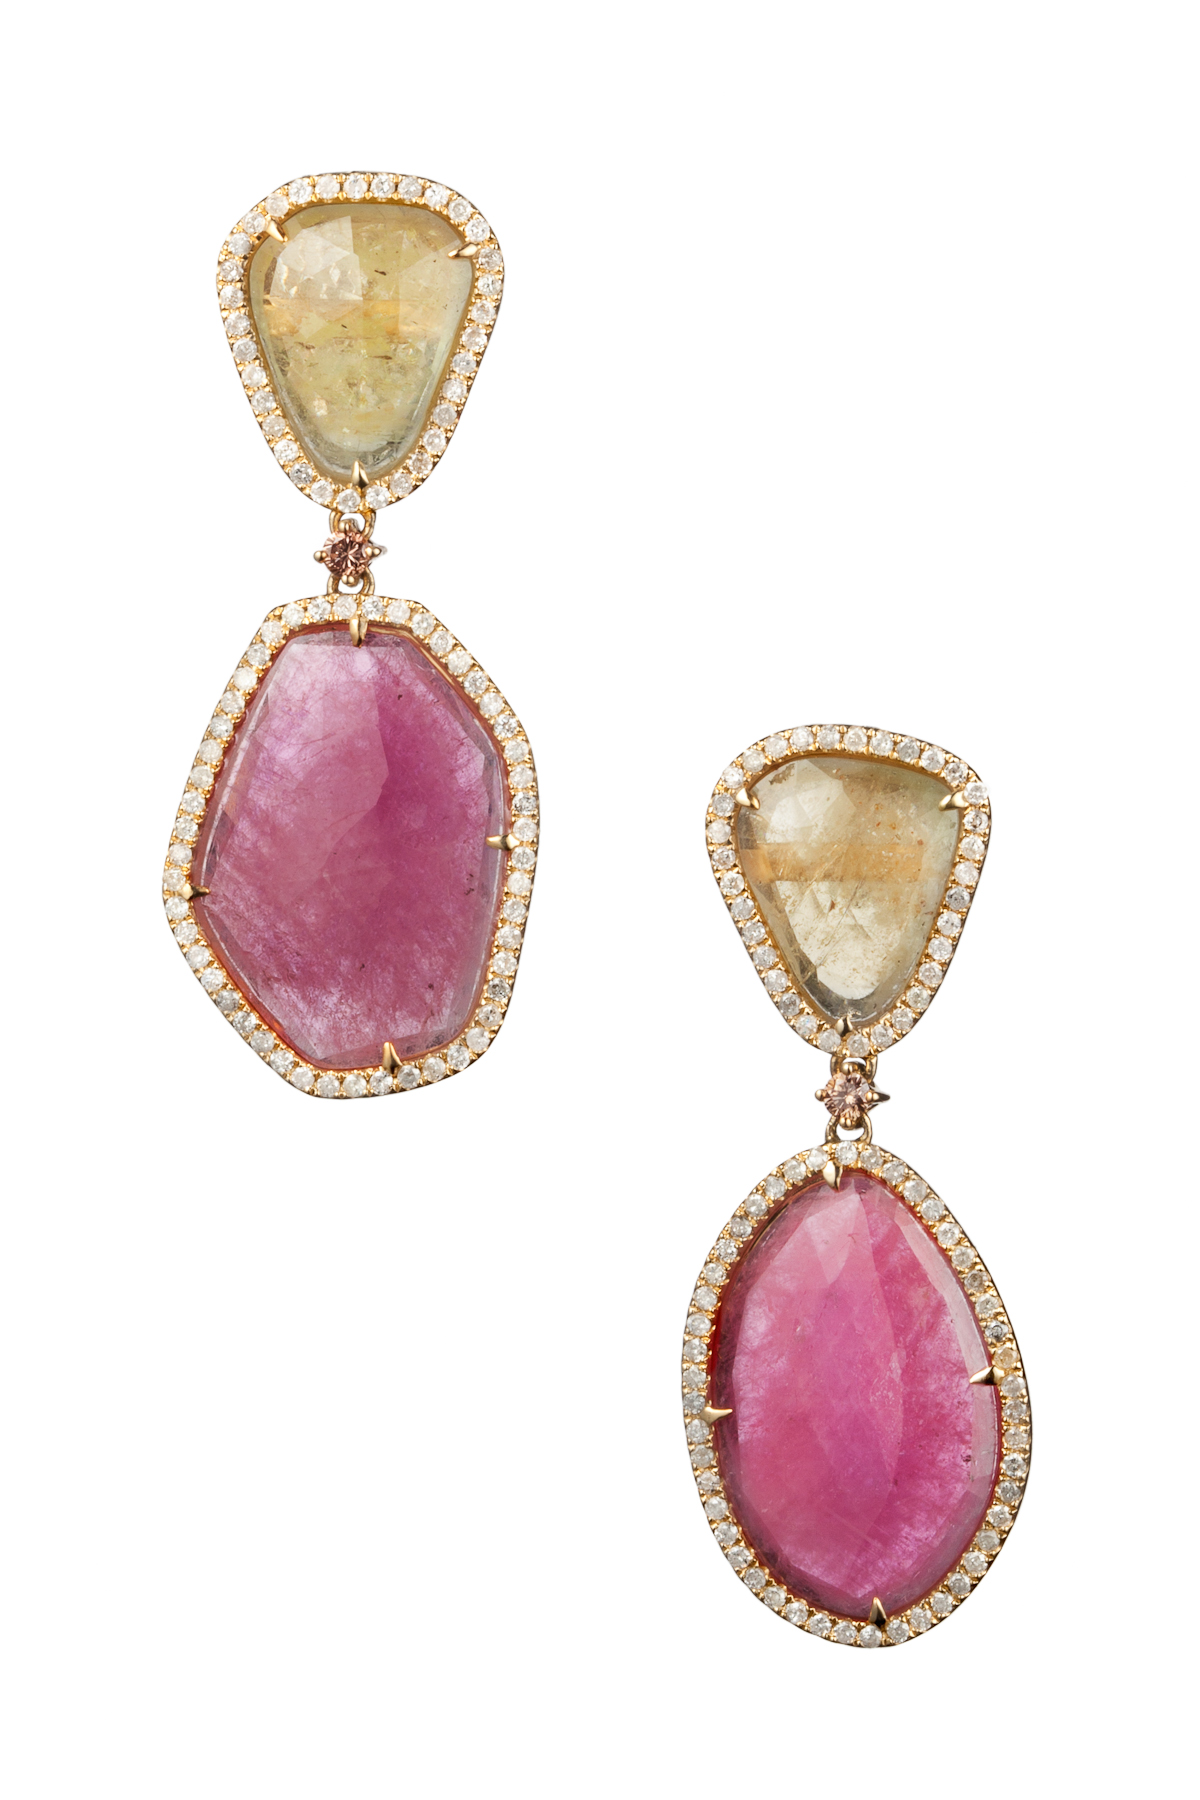 Pink Sapphire & Yellow Sapphire with Diamonds Drop Earrings